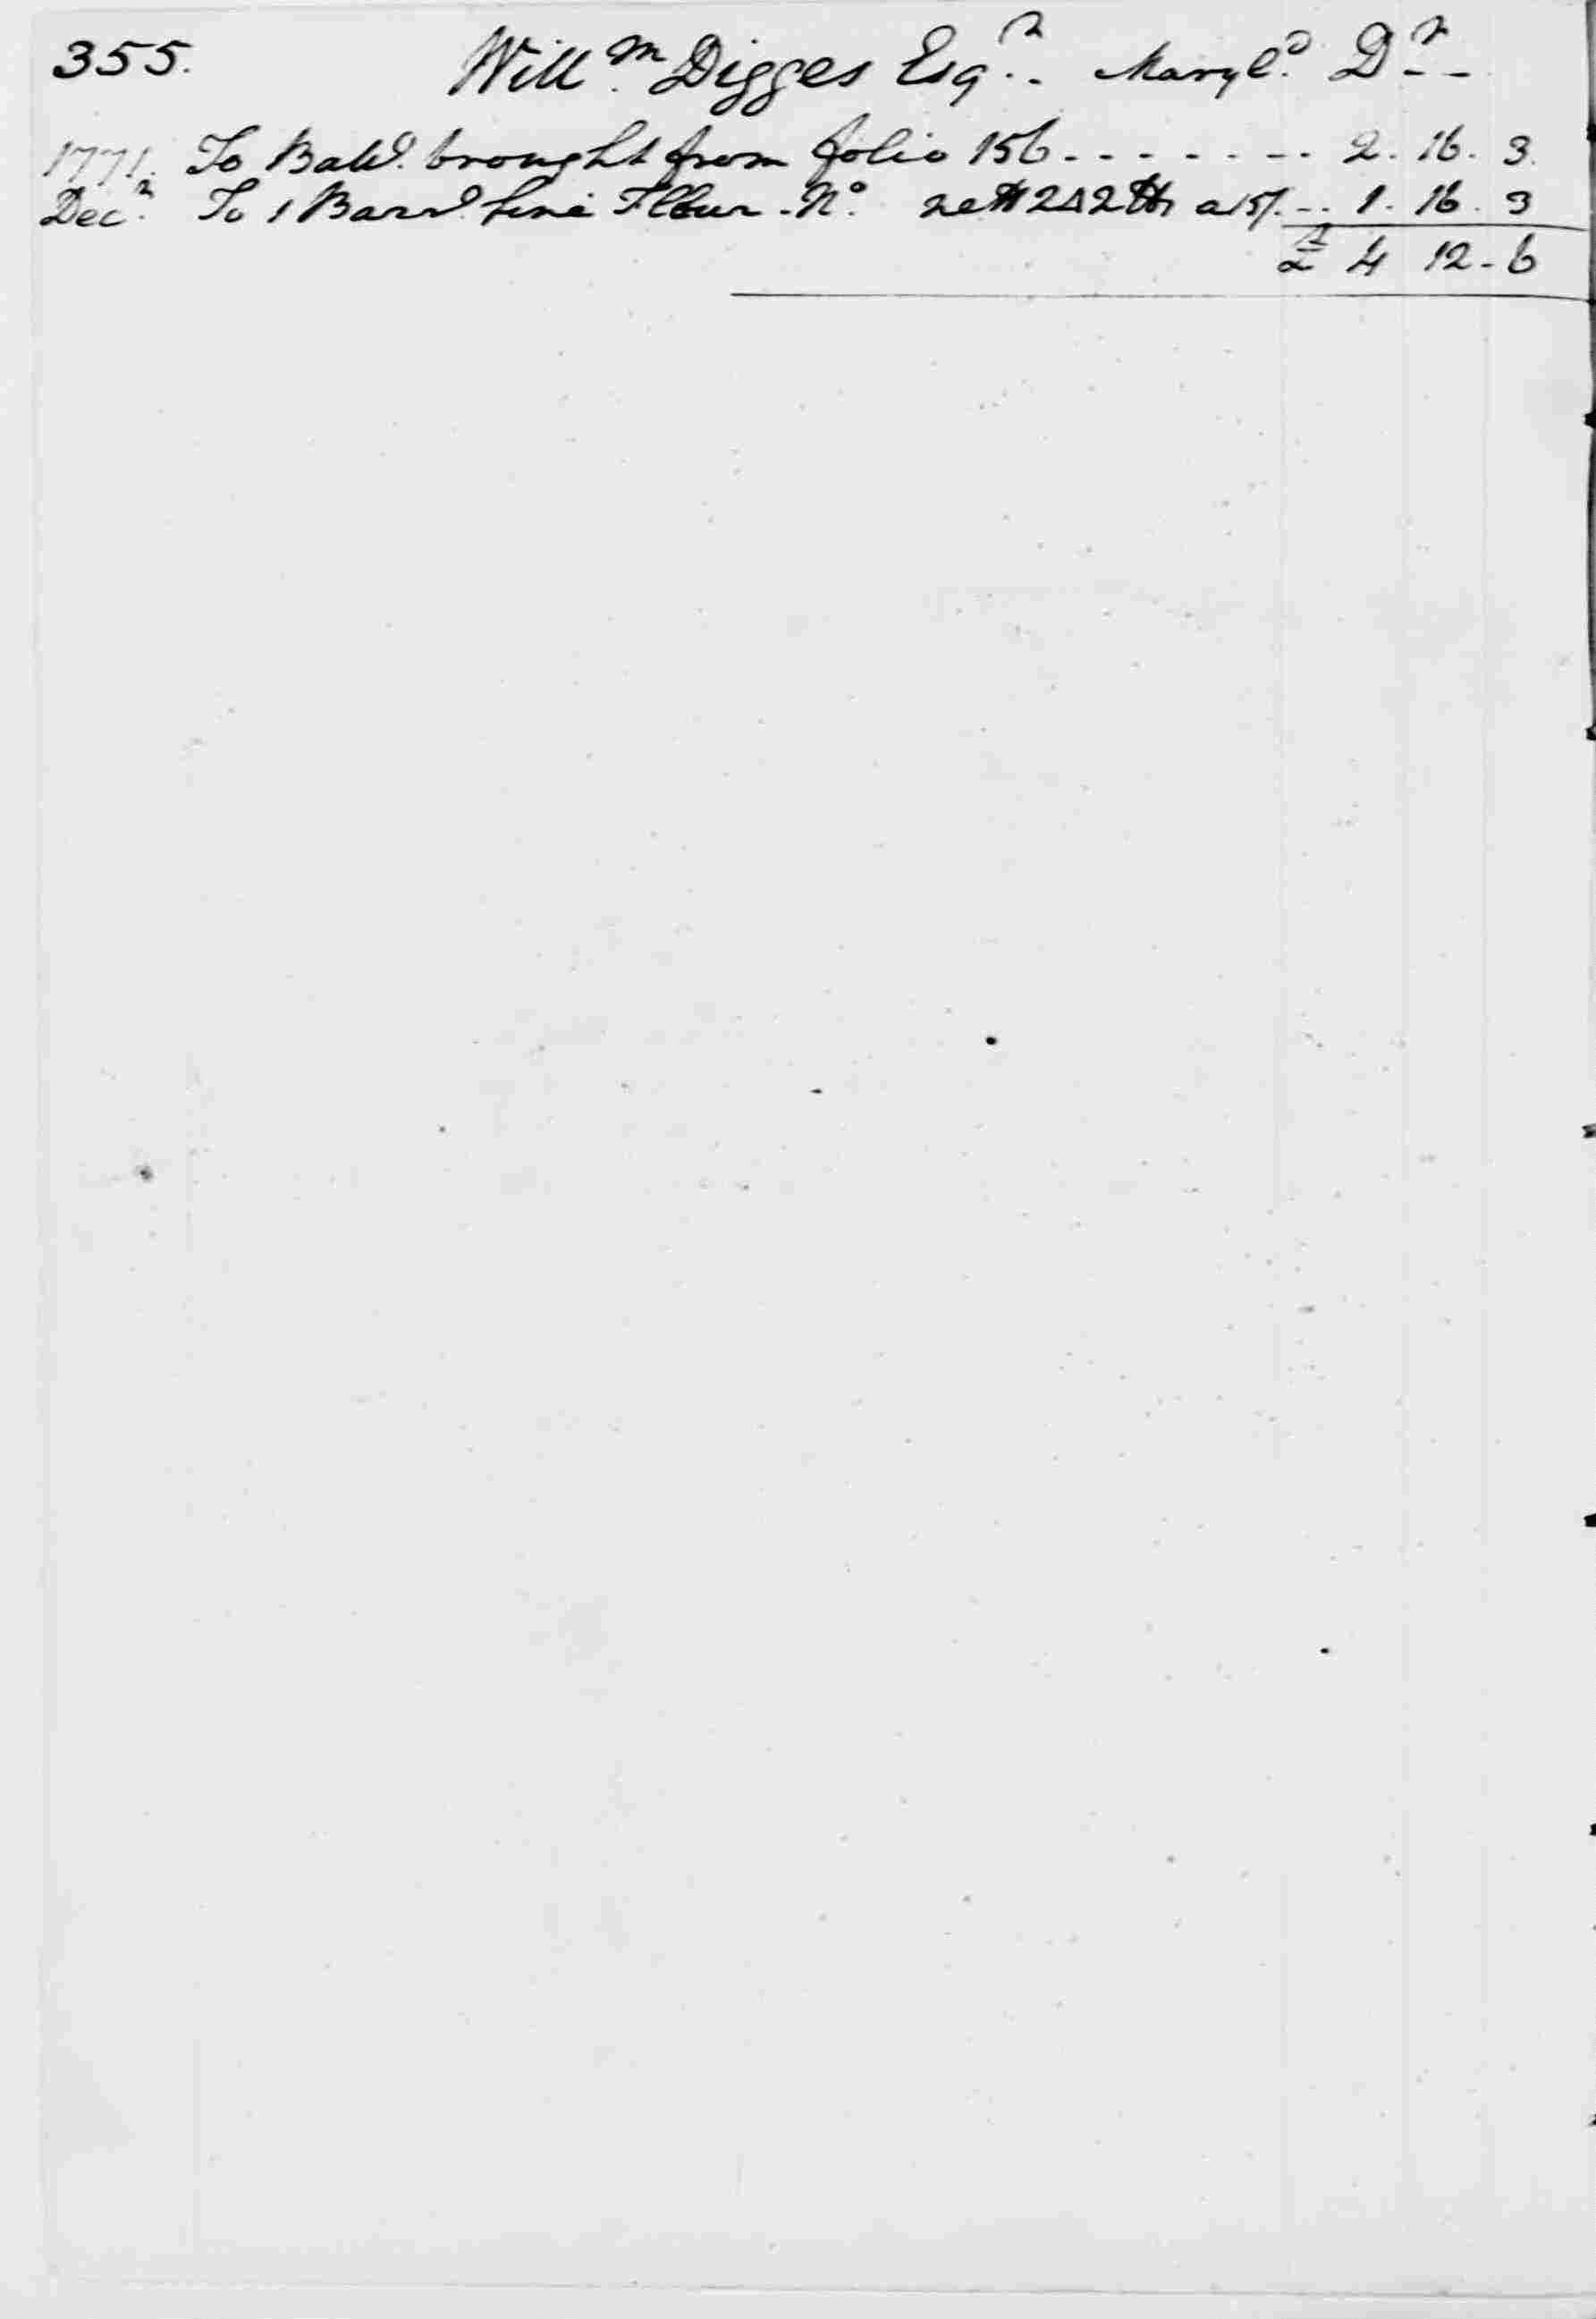 Ledger A, folio 355, left side